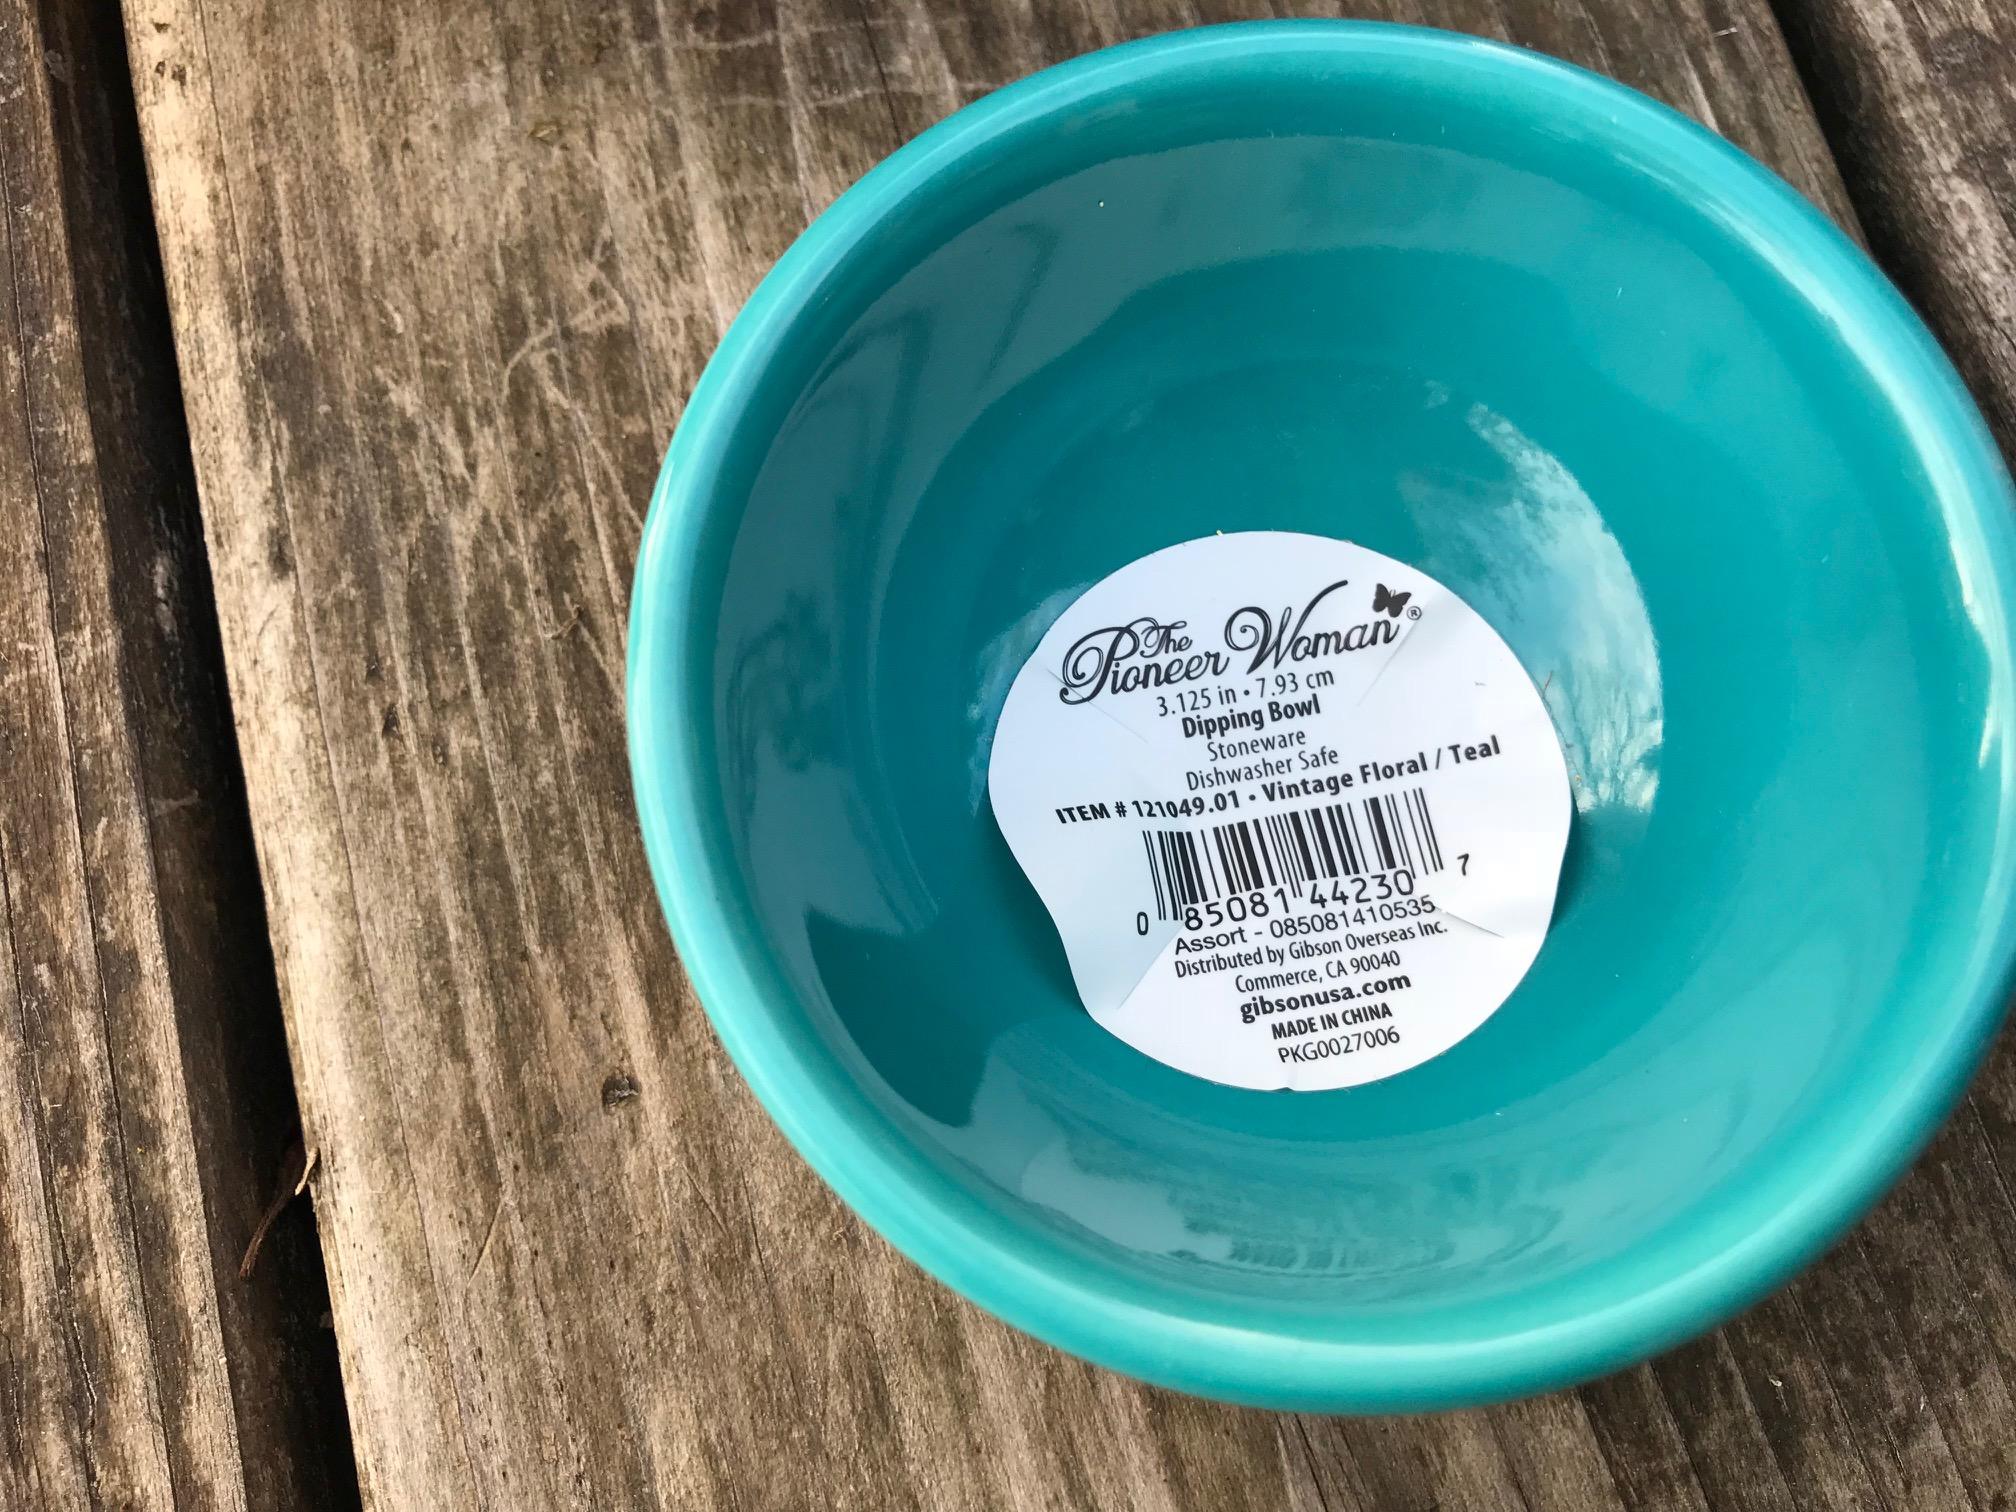 Pioneer Woman Vintage Floral / Teal Dipping Bowl: as high as 6,140 ppm Lead